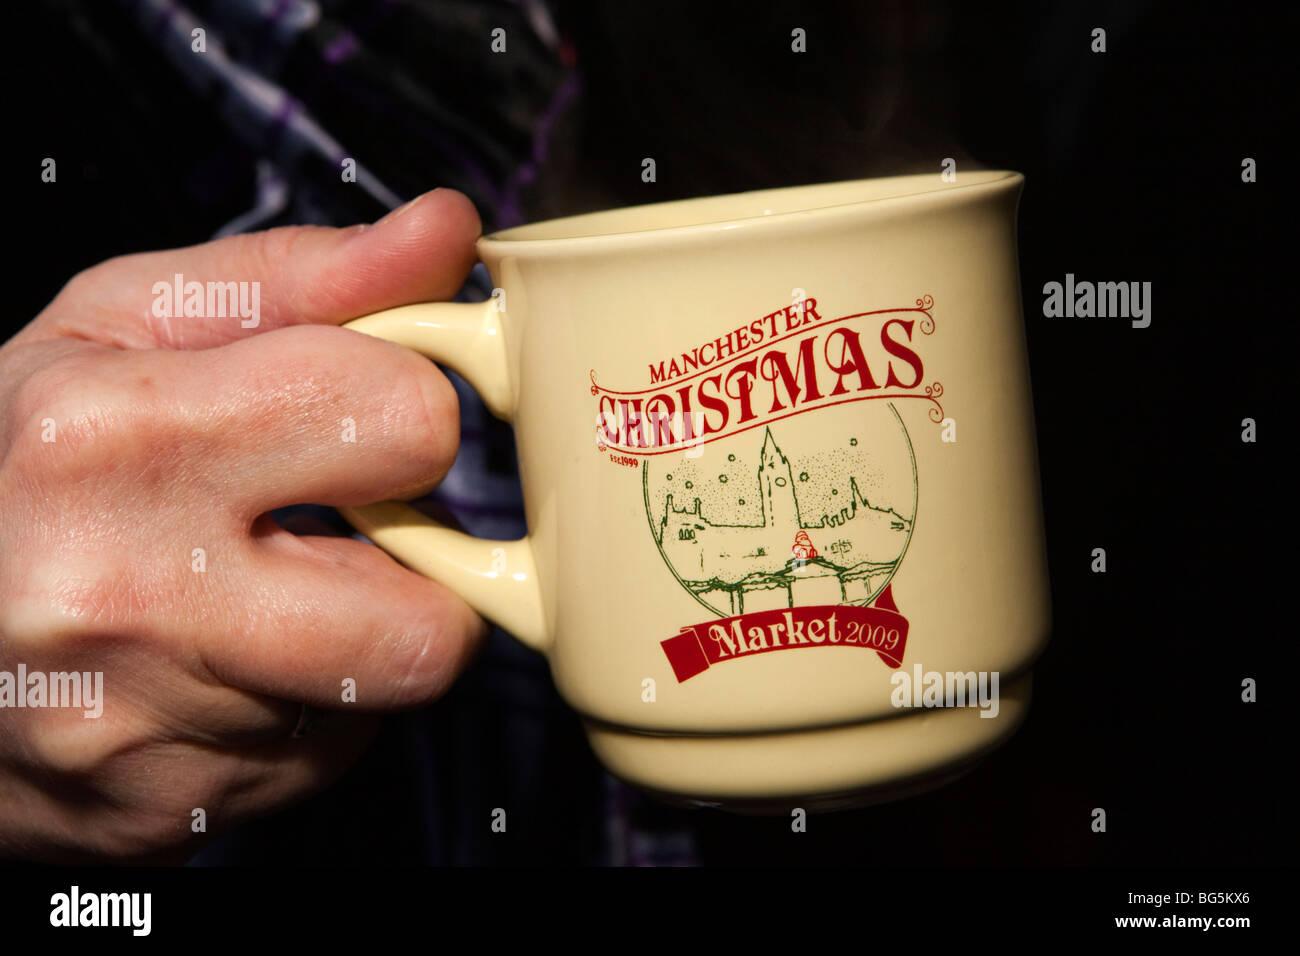 UK, England, Manchester, St Annes Square Christmas Market, hand holding commemoration mug - Stock Image